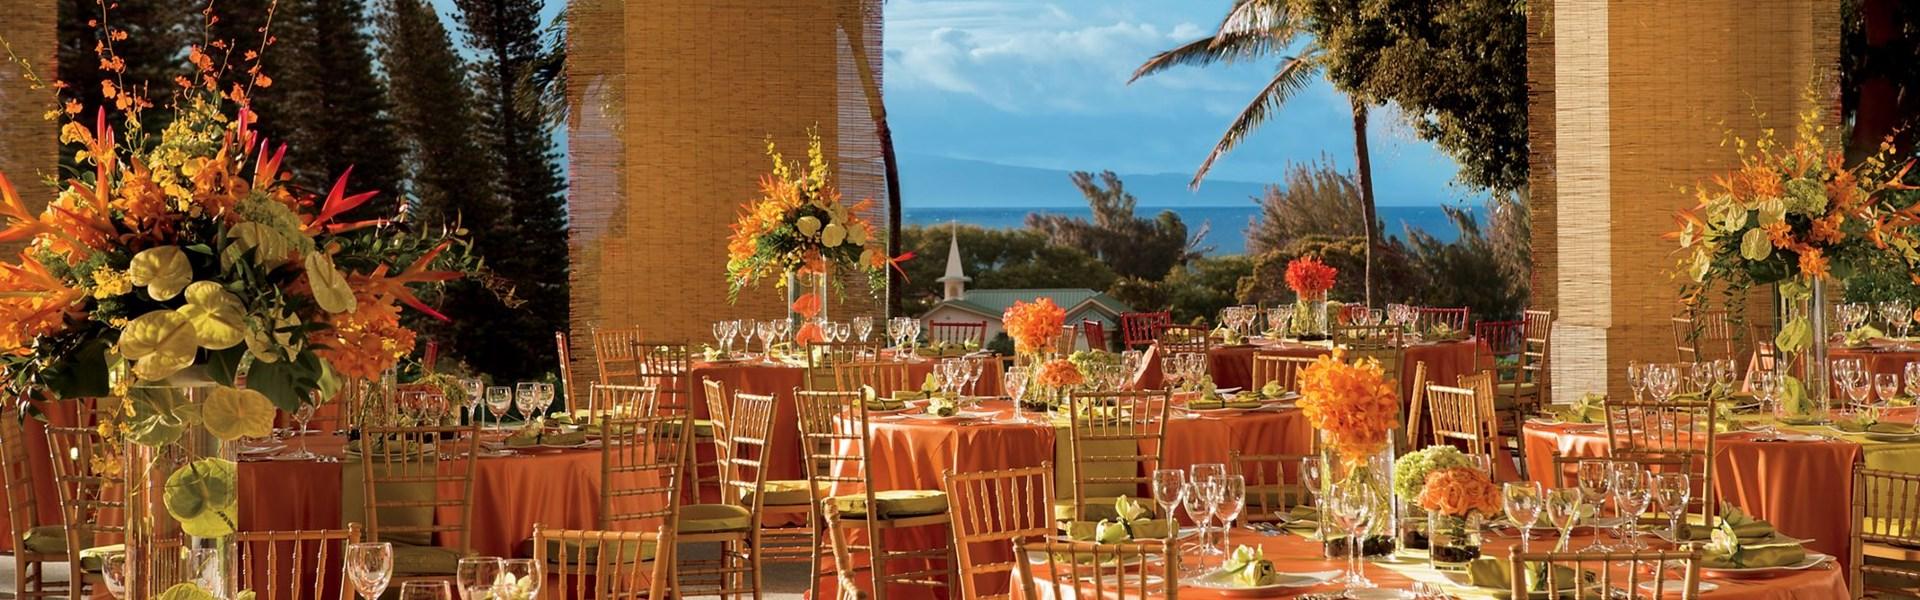 The Ritz-Carlton, Kapalua Wedding Venue